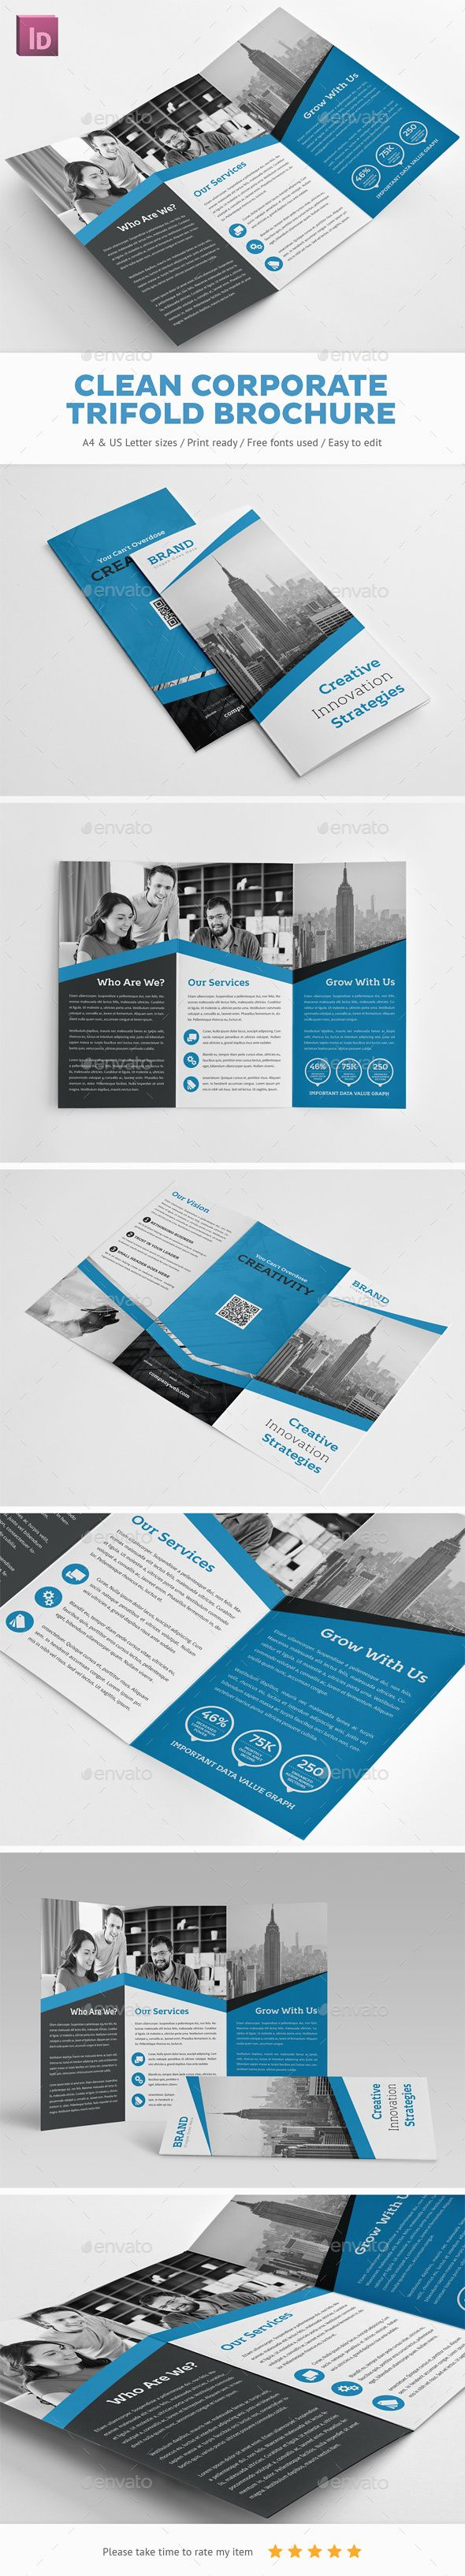 Clean Corporate Trifold Brochure | Pinterest | Corporate, Leporello ...